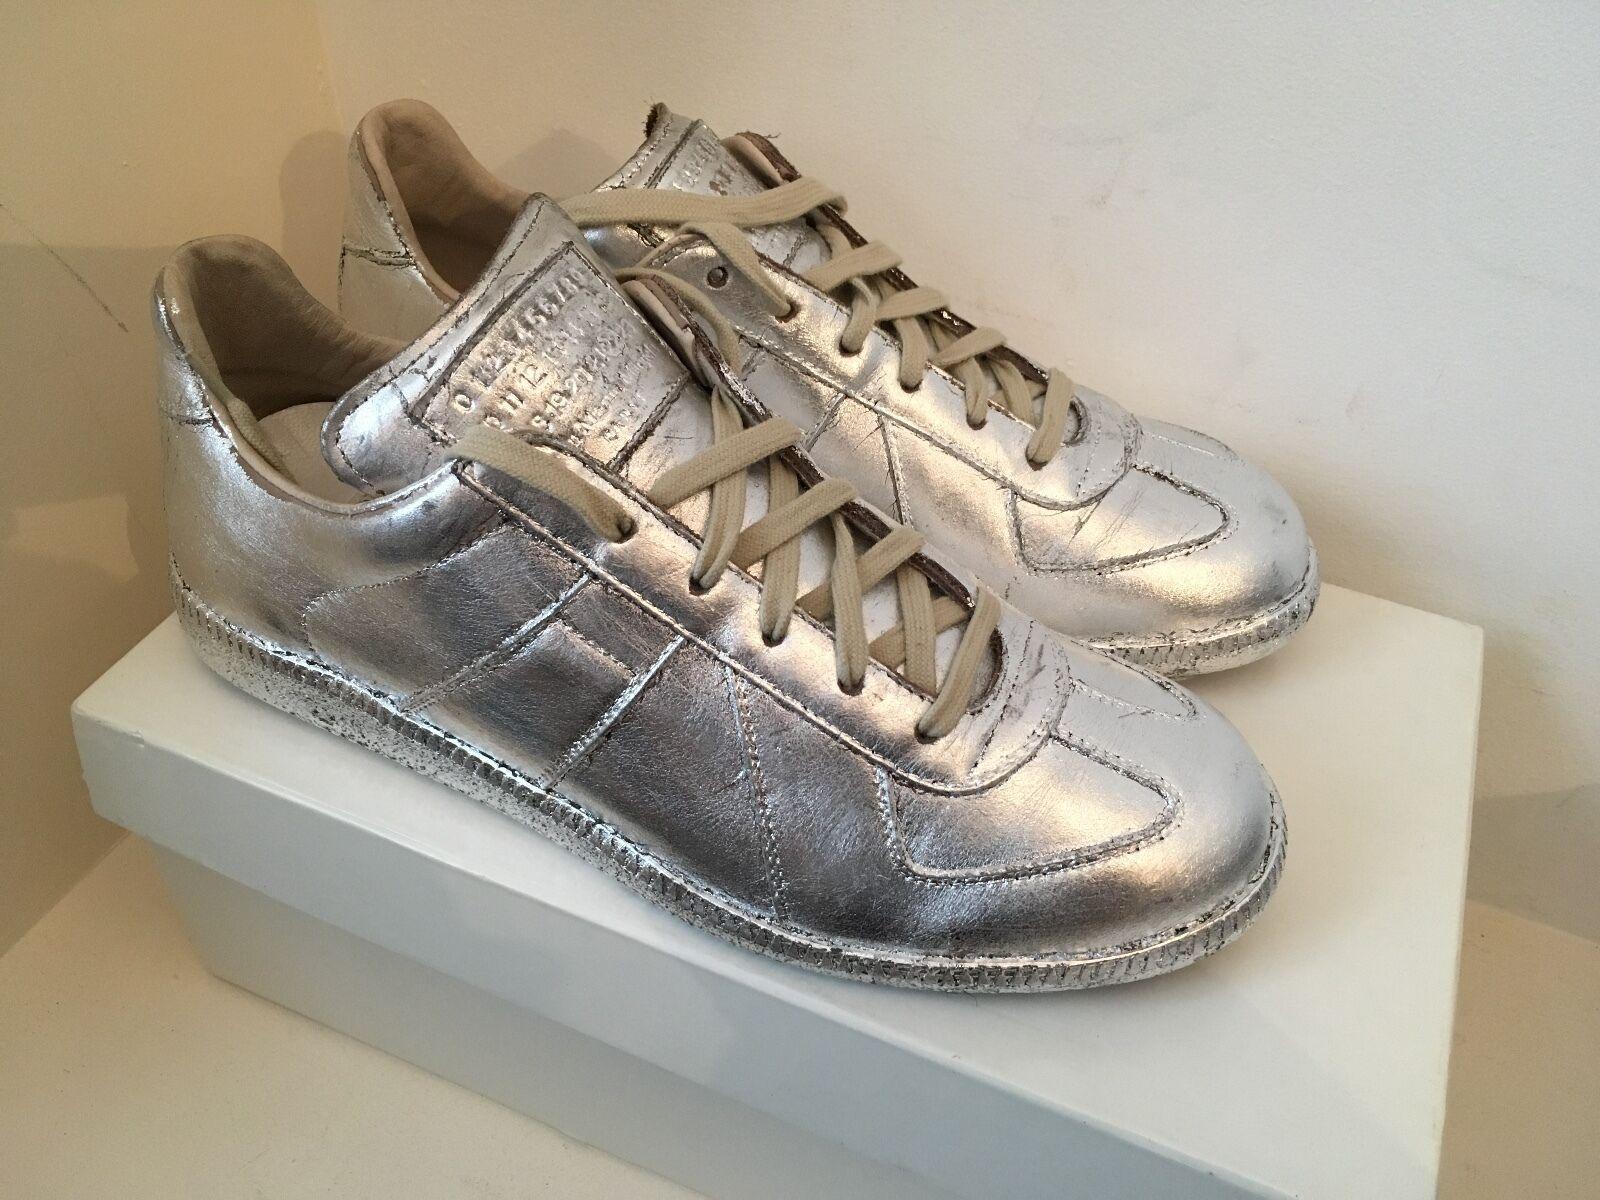 Deadstock Maison Martin Margiela  Replica Low  Silver Foil Sneakers  Trainers